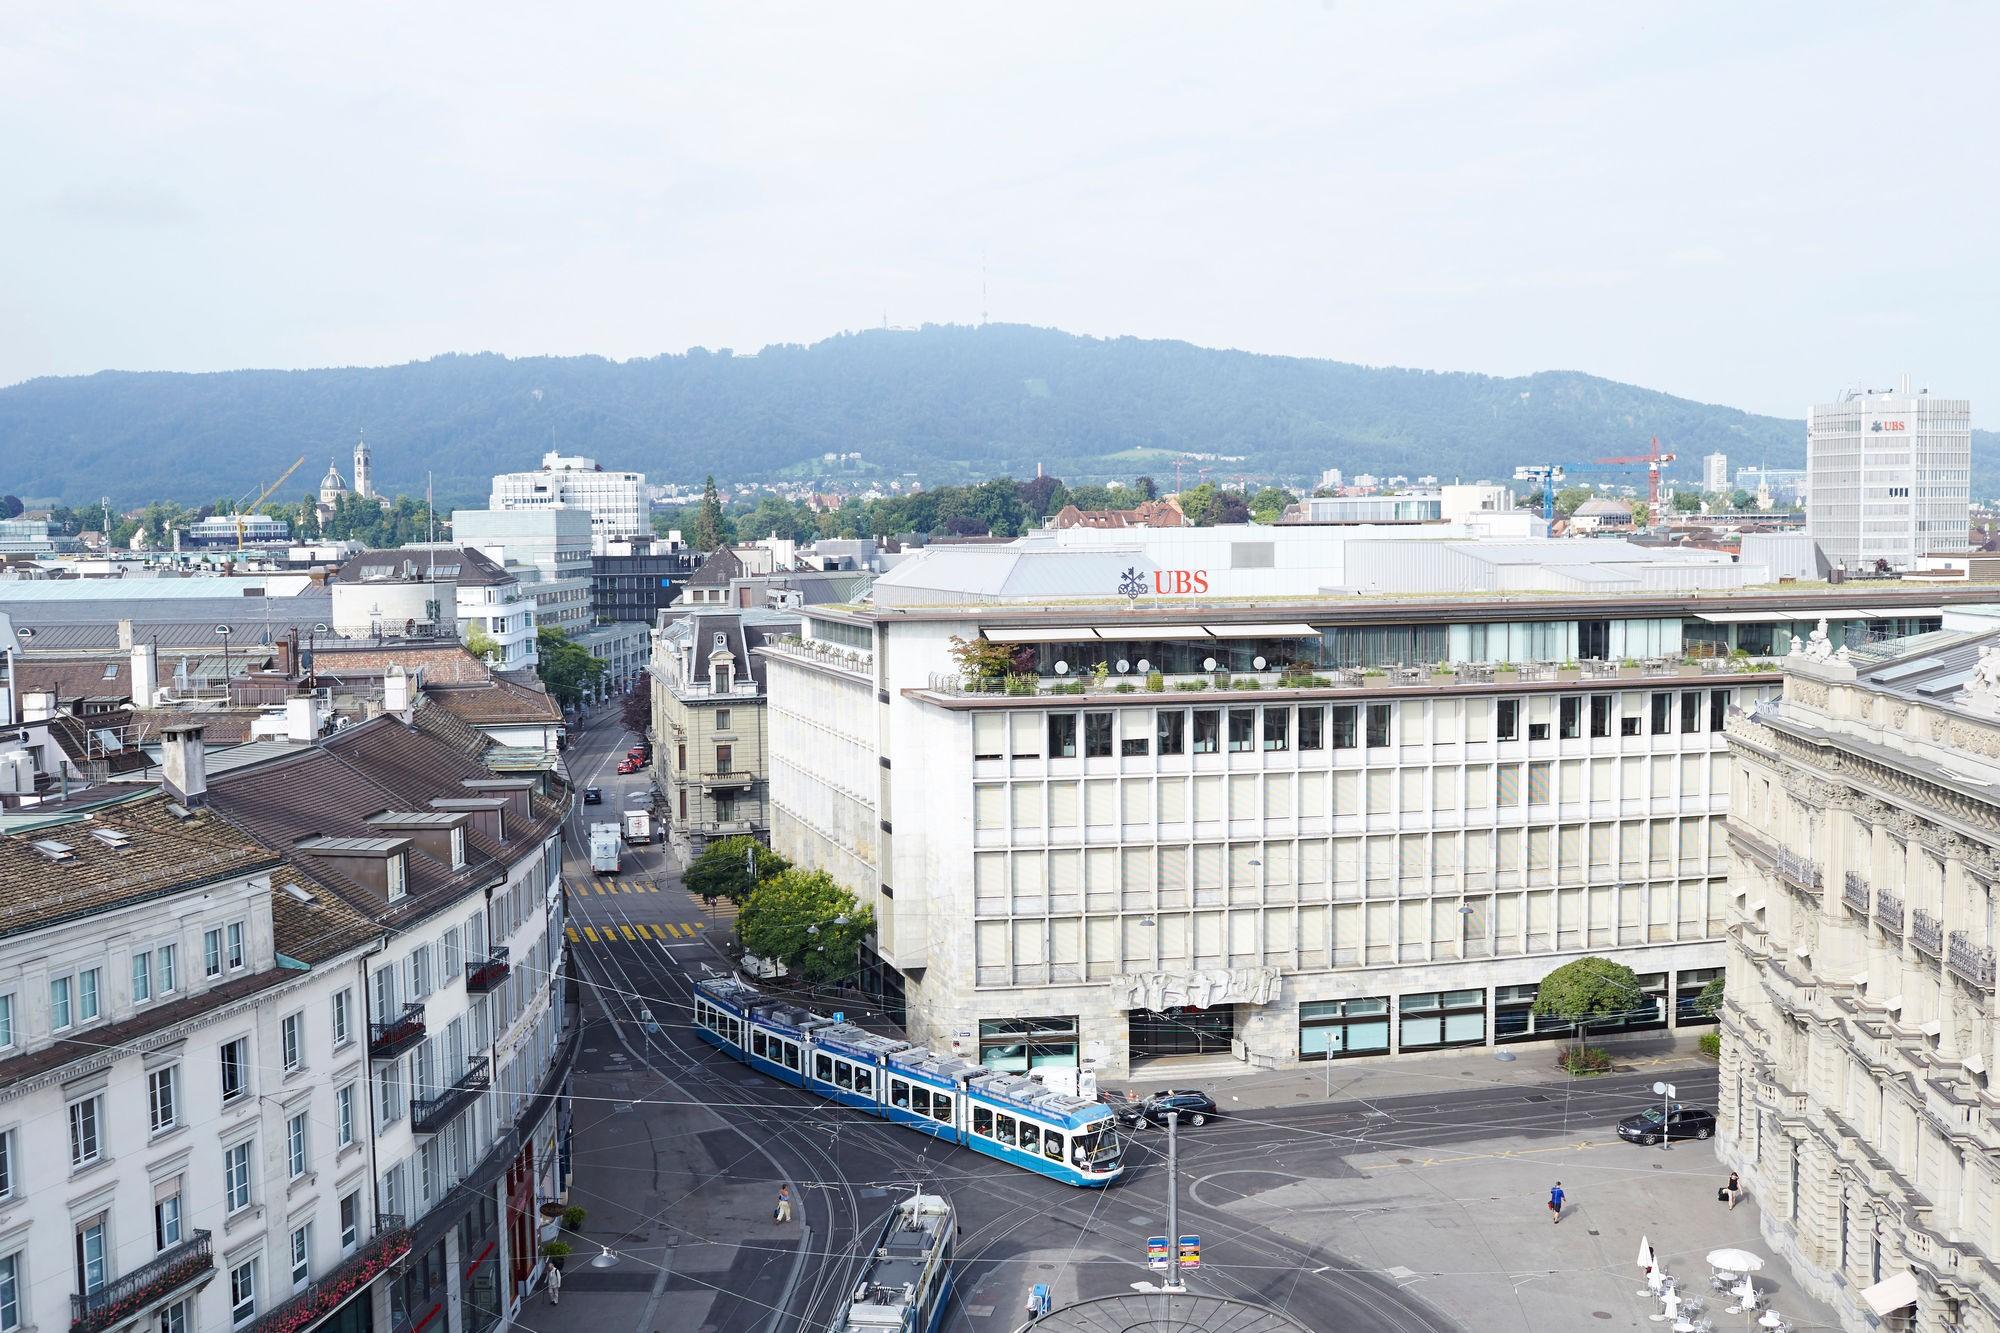 UBS Paradeplatz 1